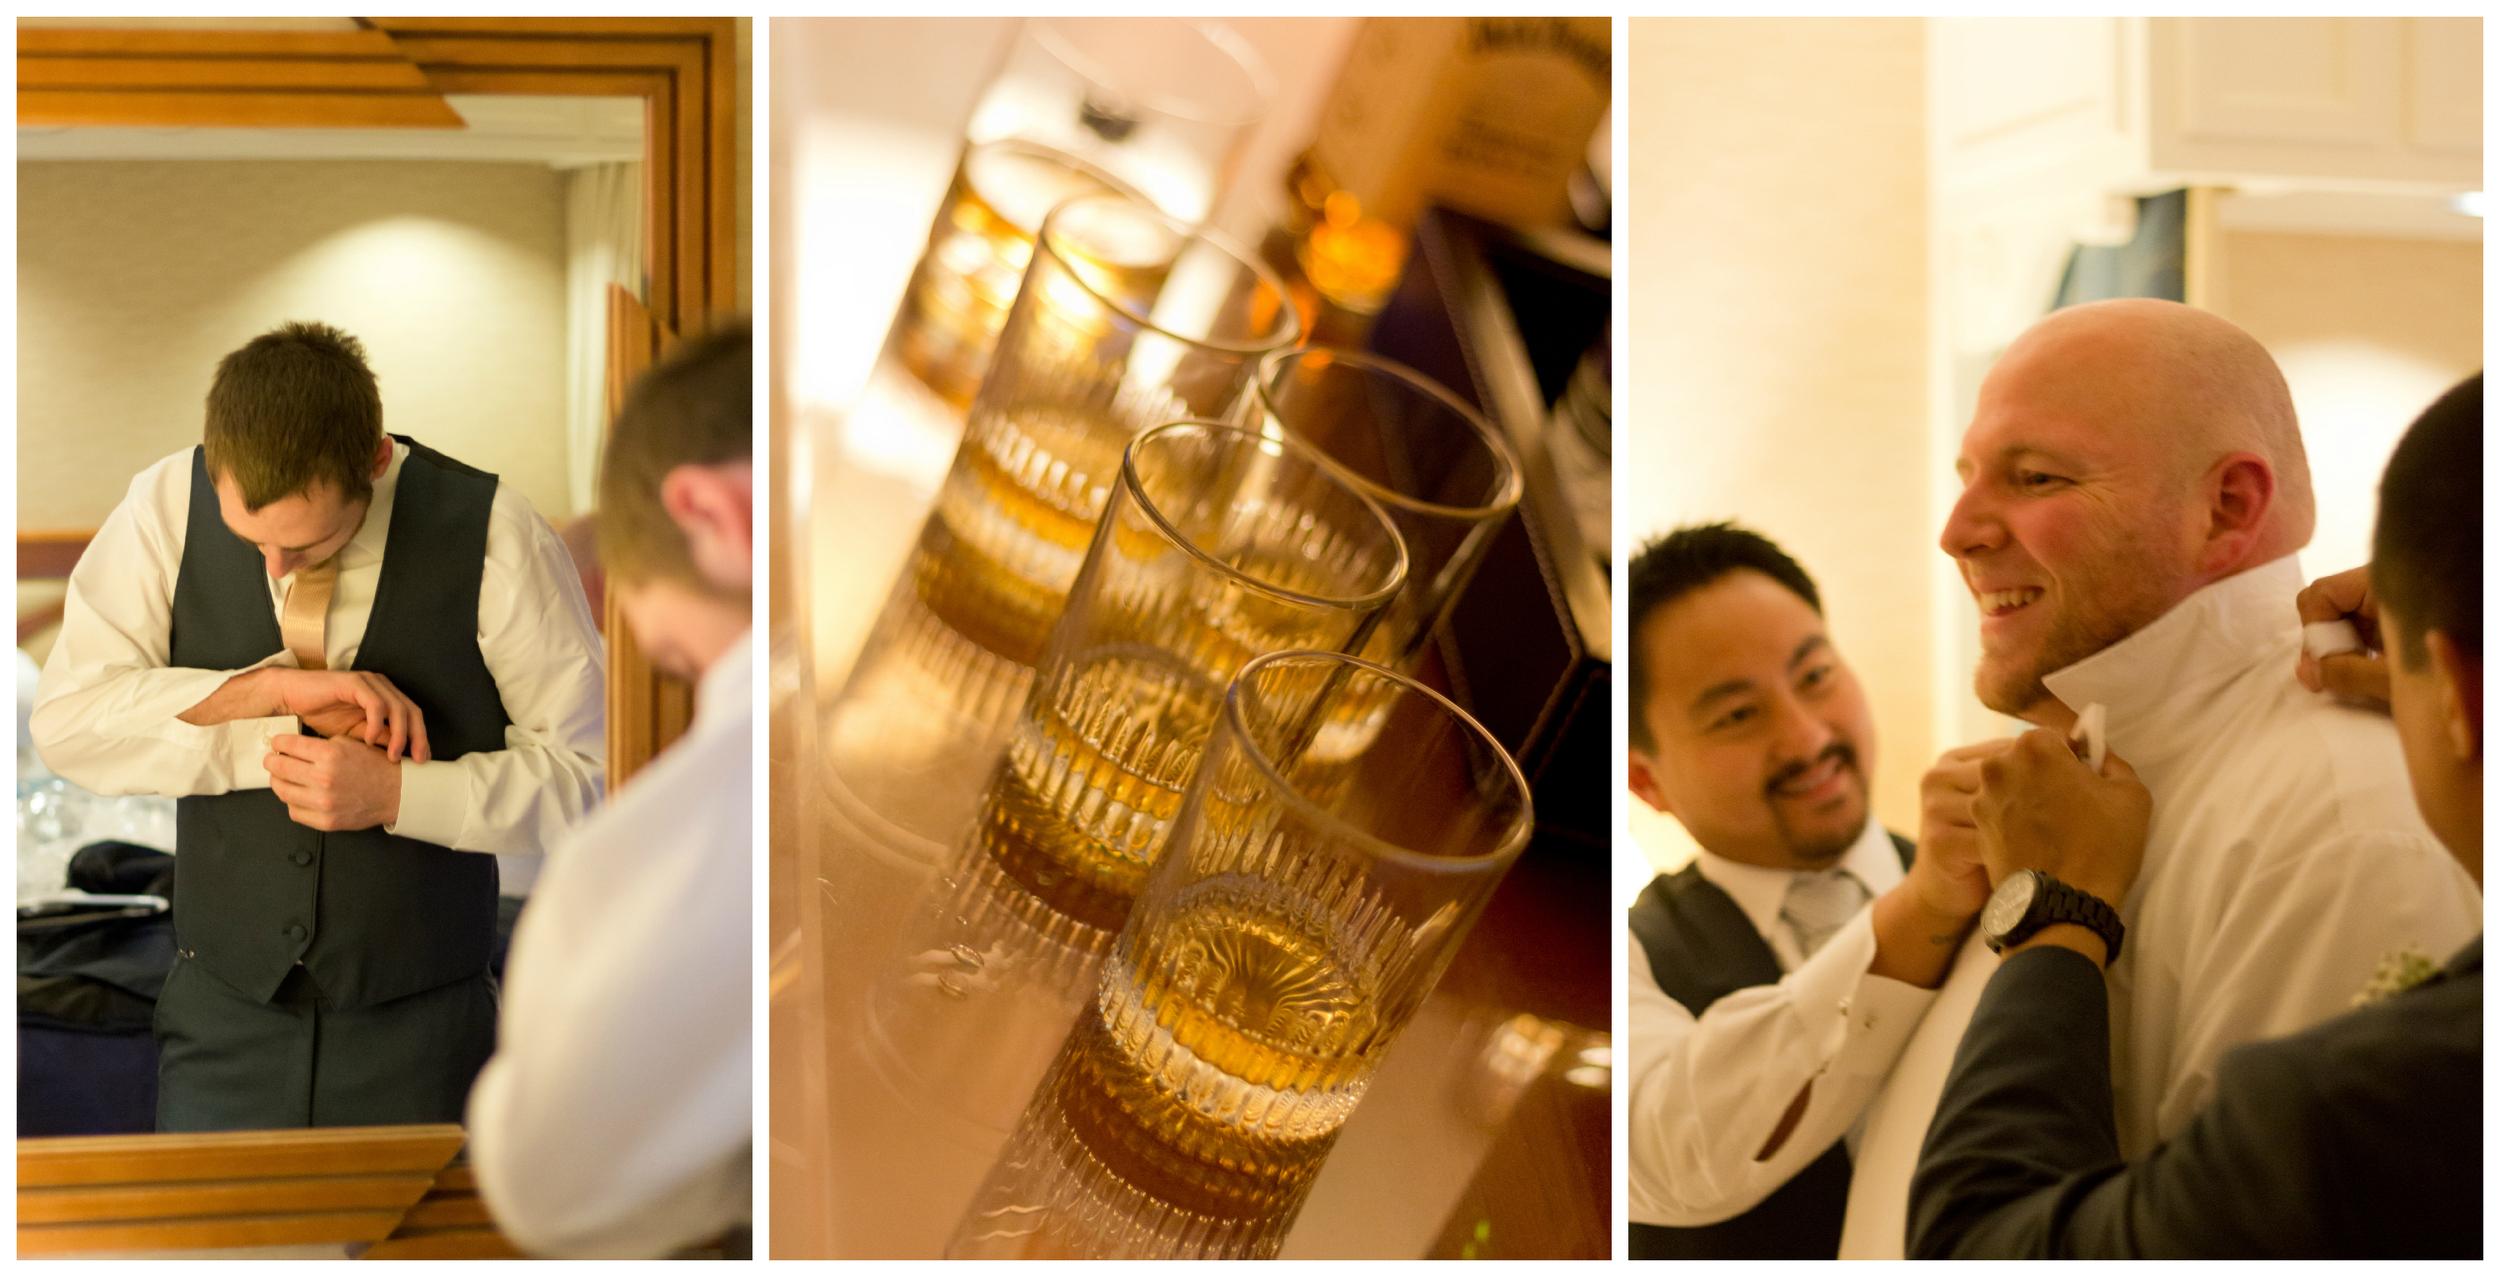 groom and groomsmen getting ready for wedding (bowtie, shot glasses, cufflinks)